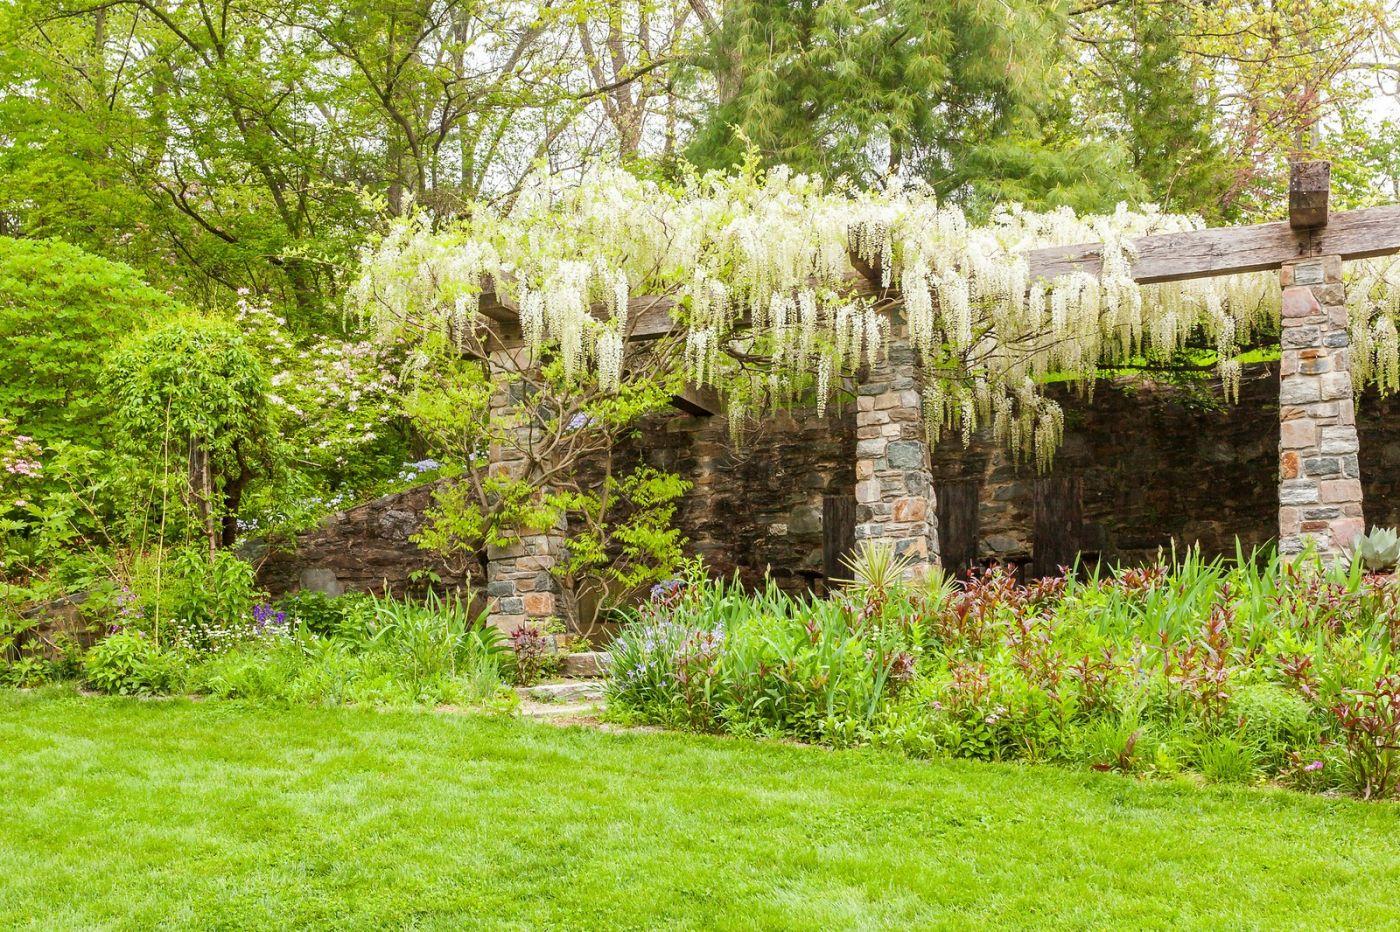 Chanticleer花园,那年盛开的紫藤花_图1-37